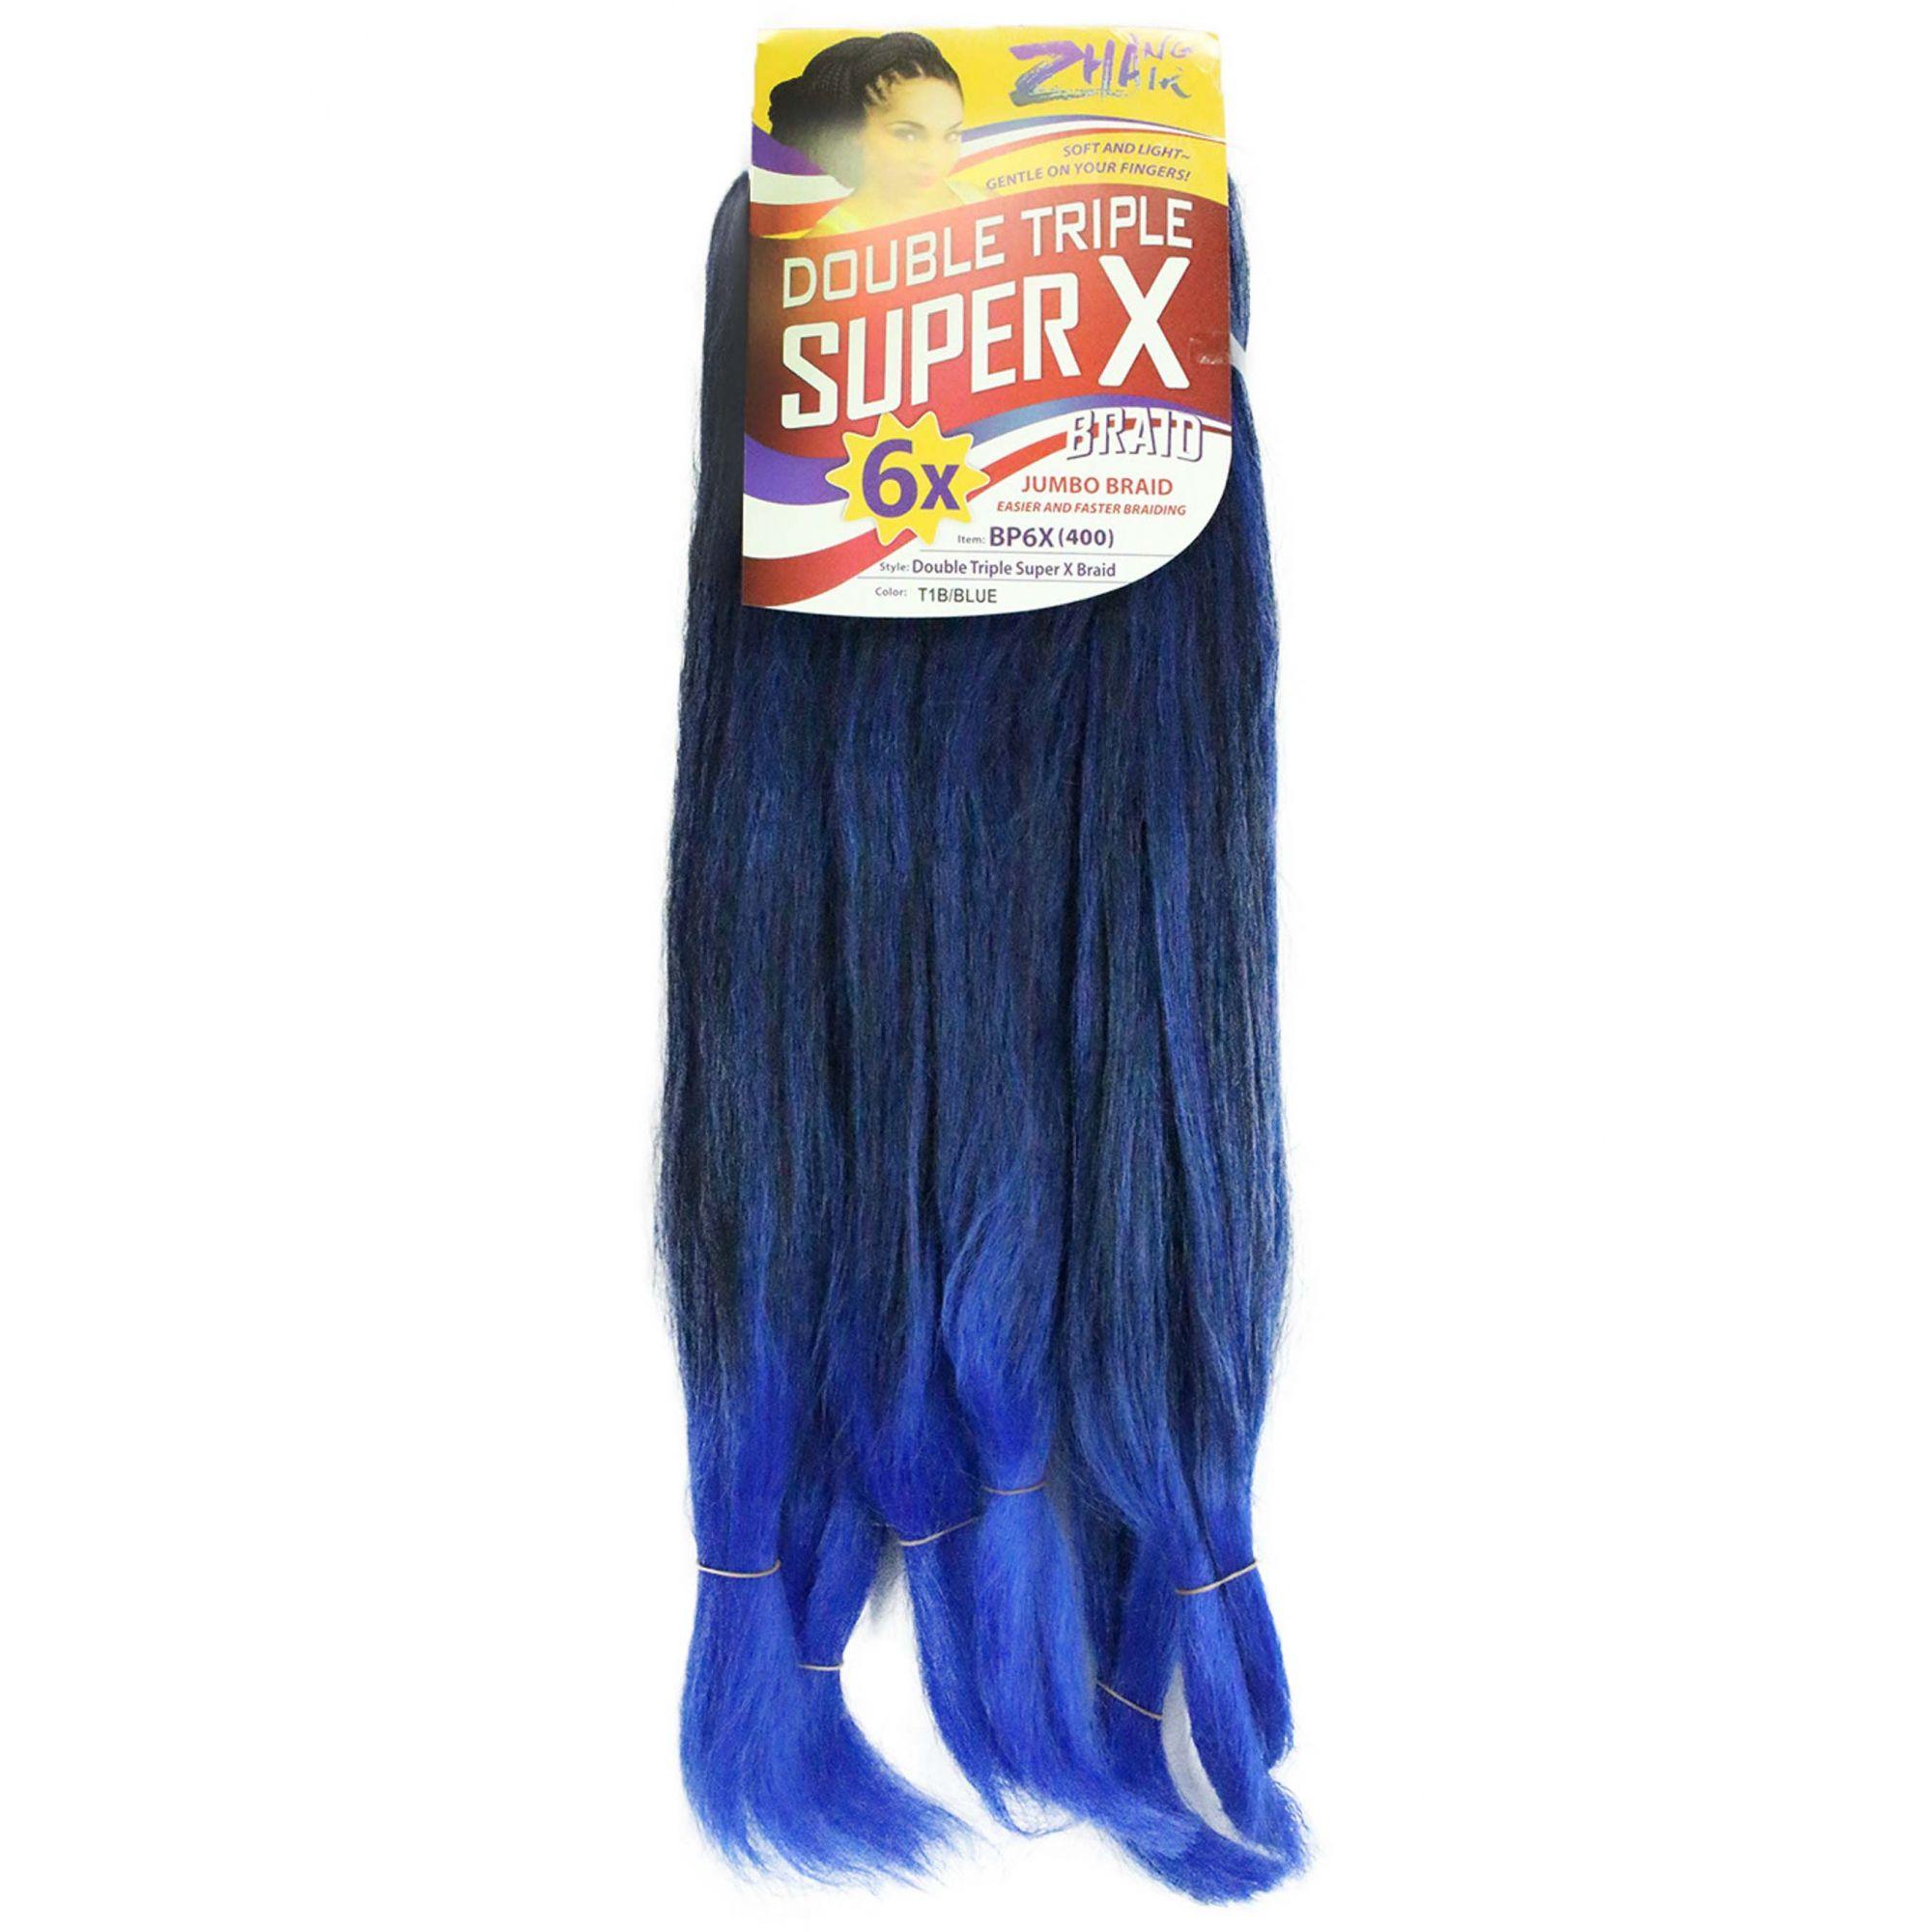 Cabelo Sintético - Zhang hair jumbo - Super X (400g) - Cor: Preto com Azul (T1B/Blue)